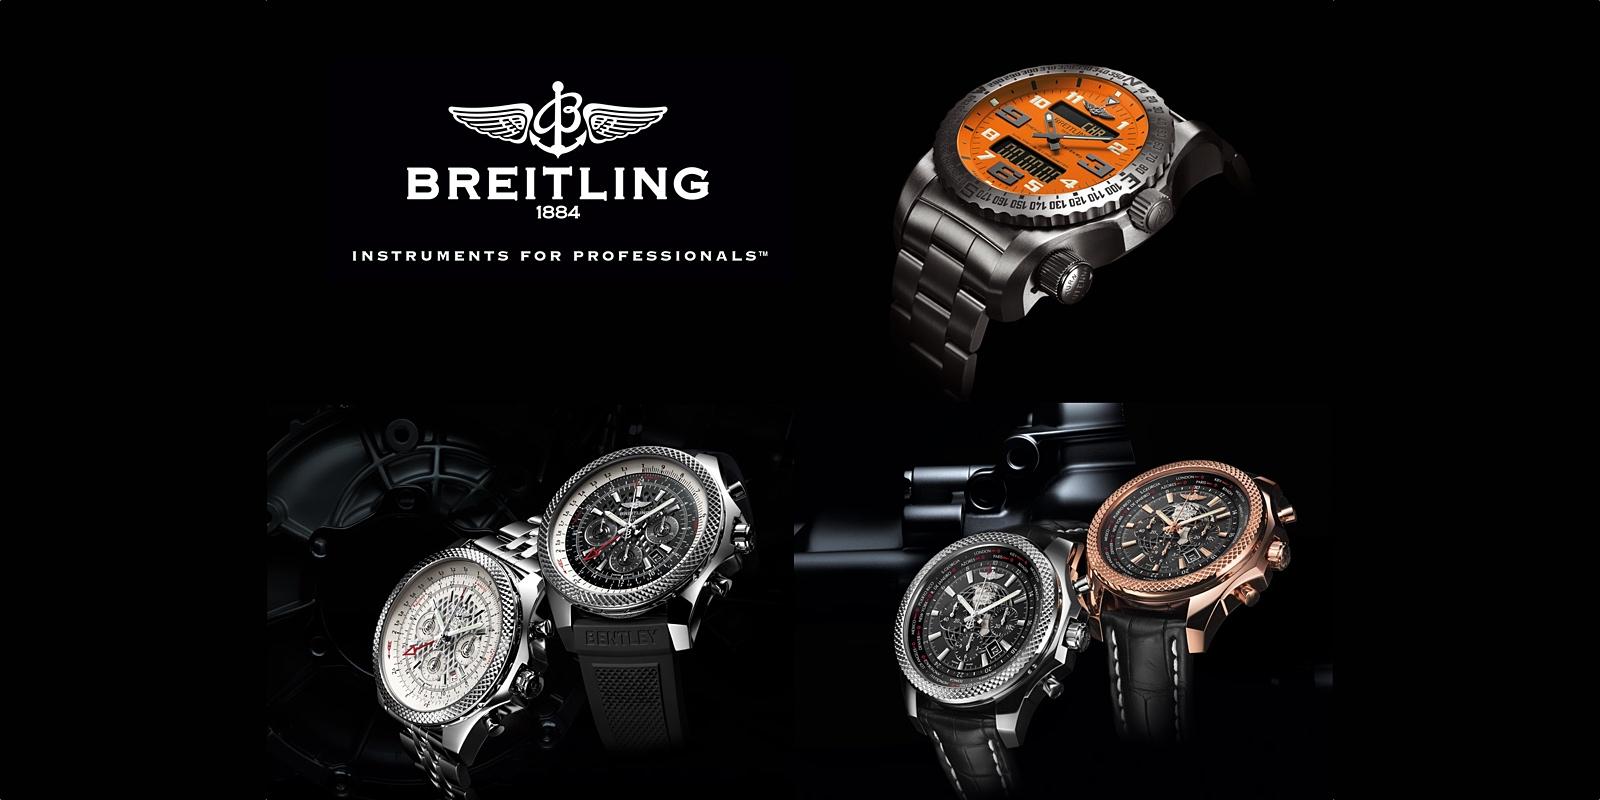 basel 2013 Breitling cover